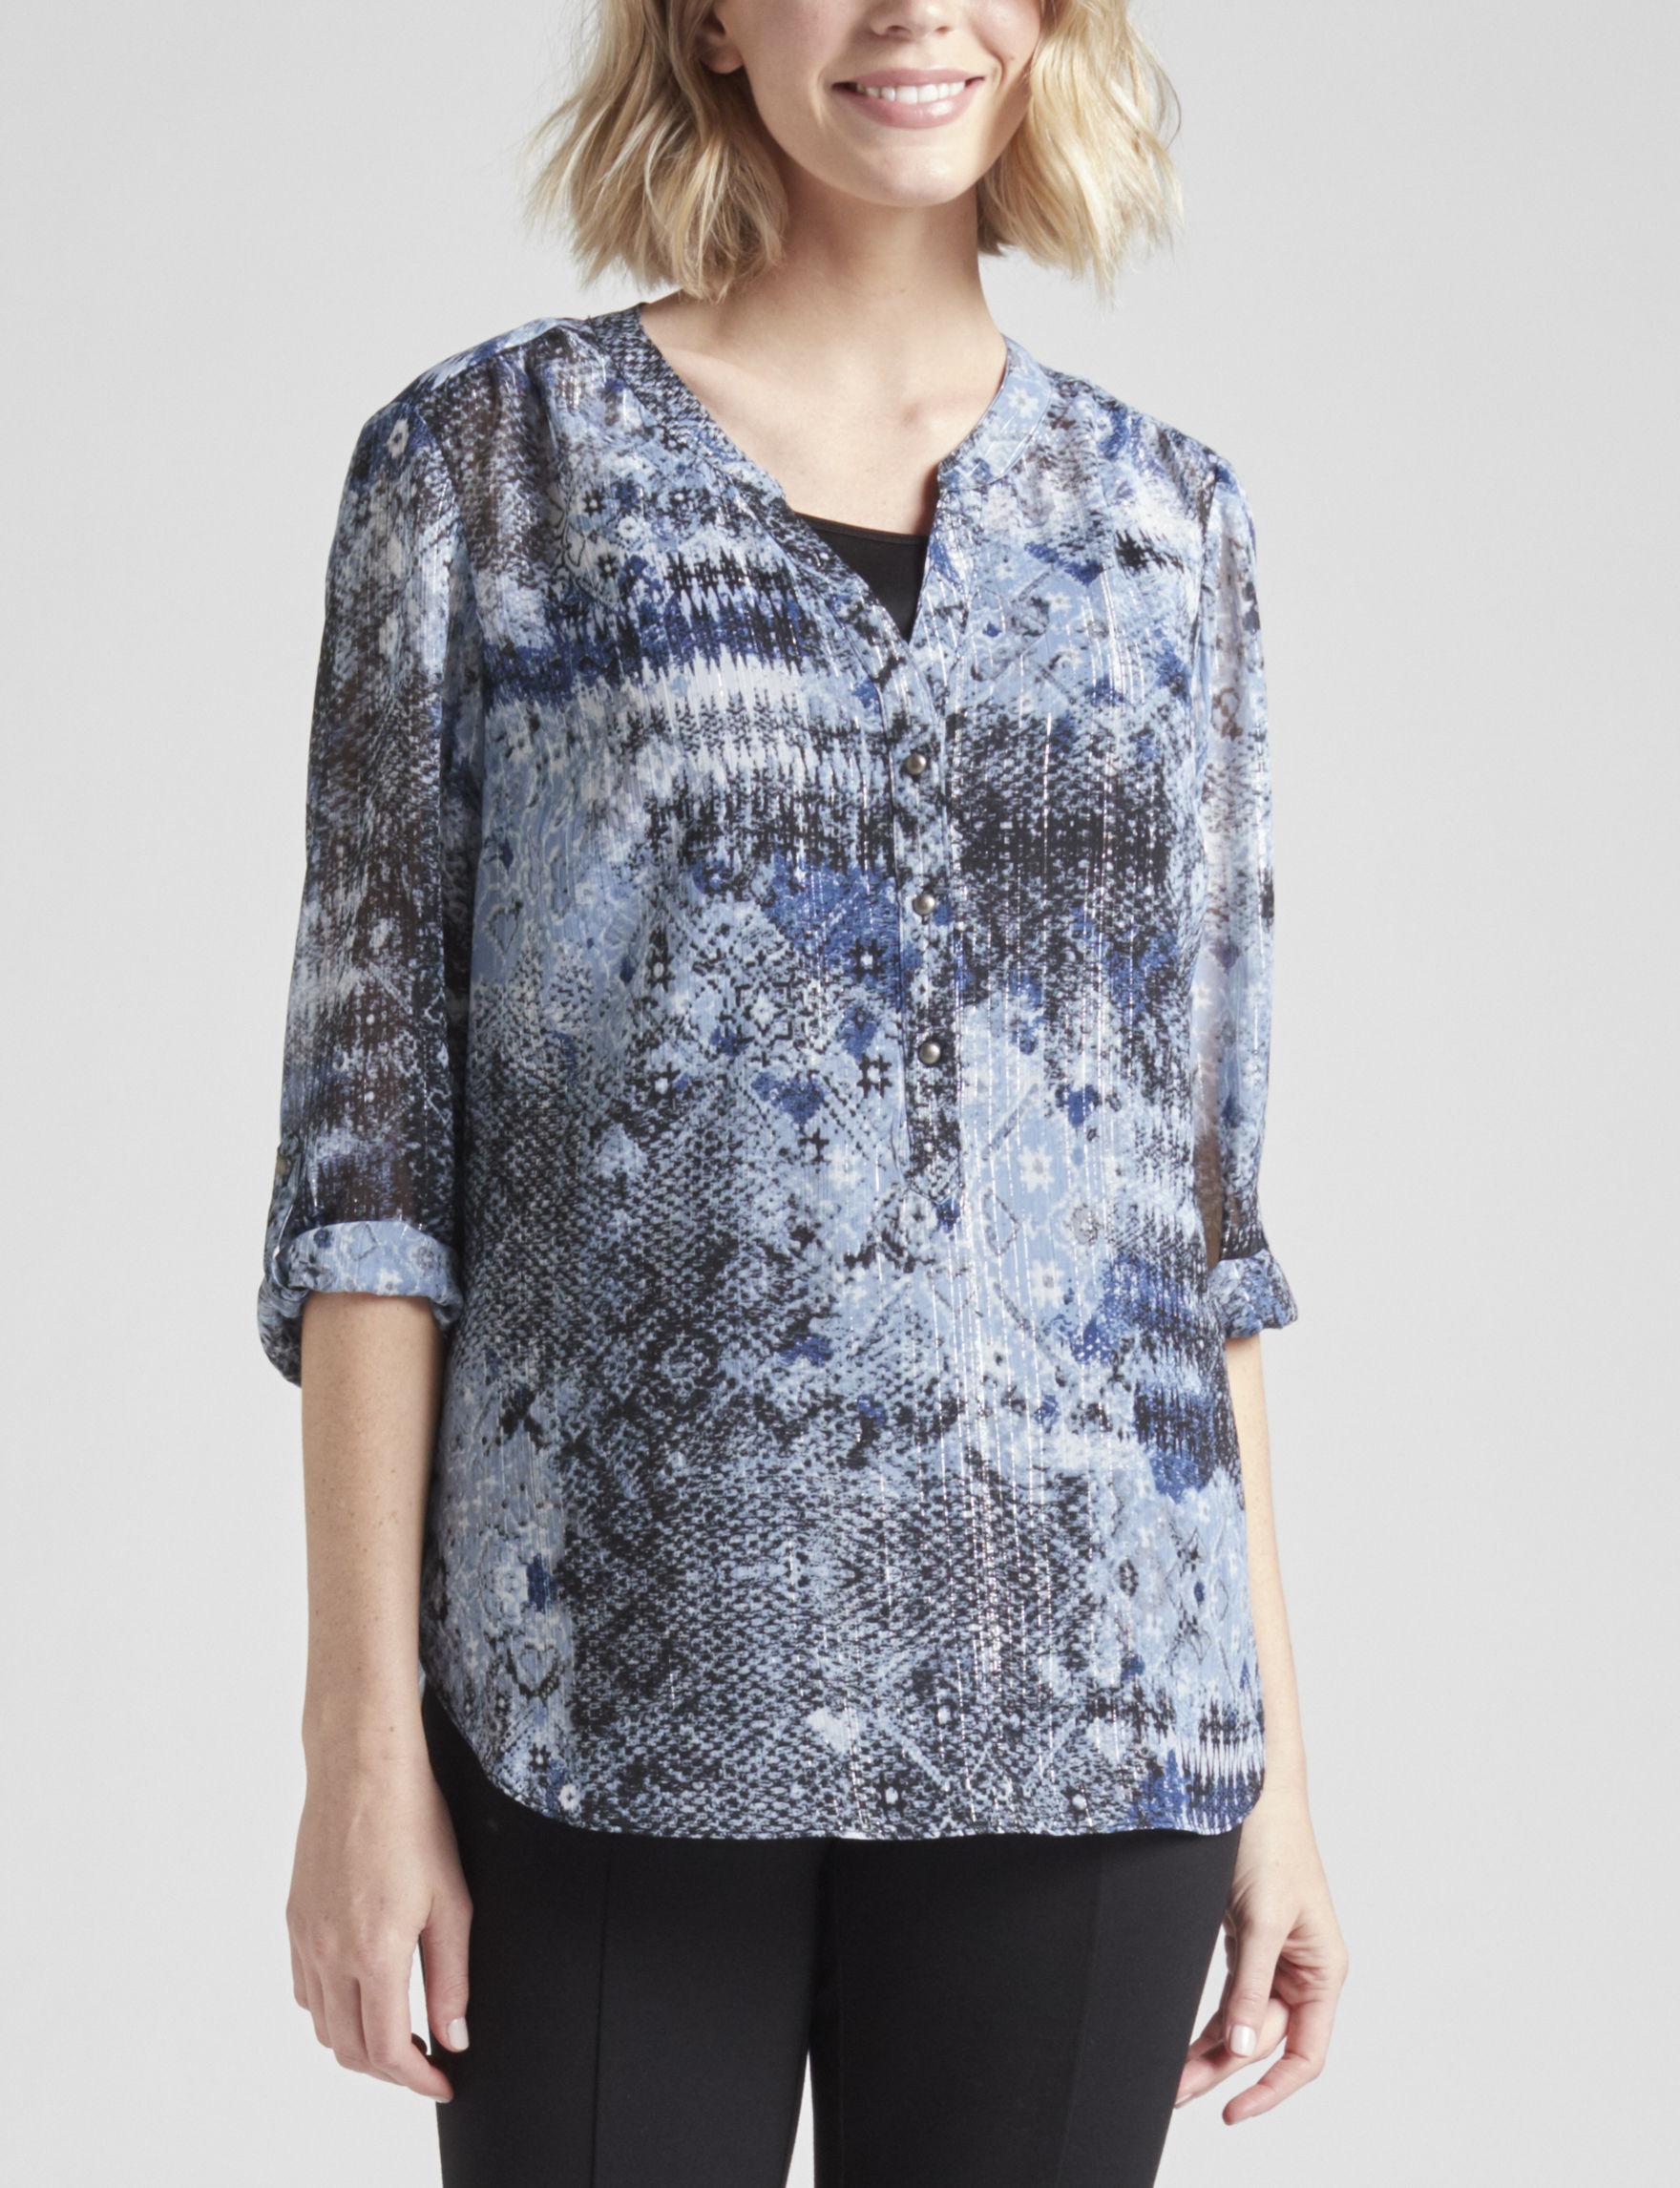 Sara Michelle Blue Shirts & Blouses